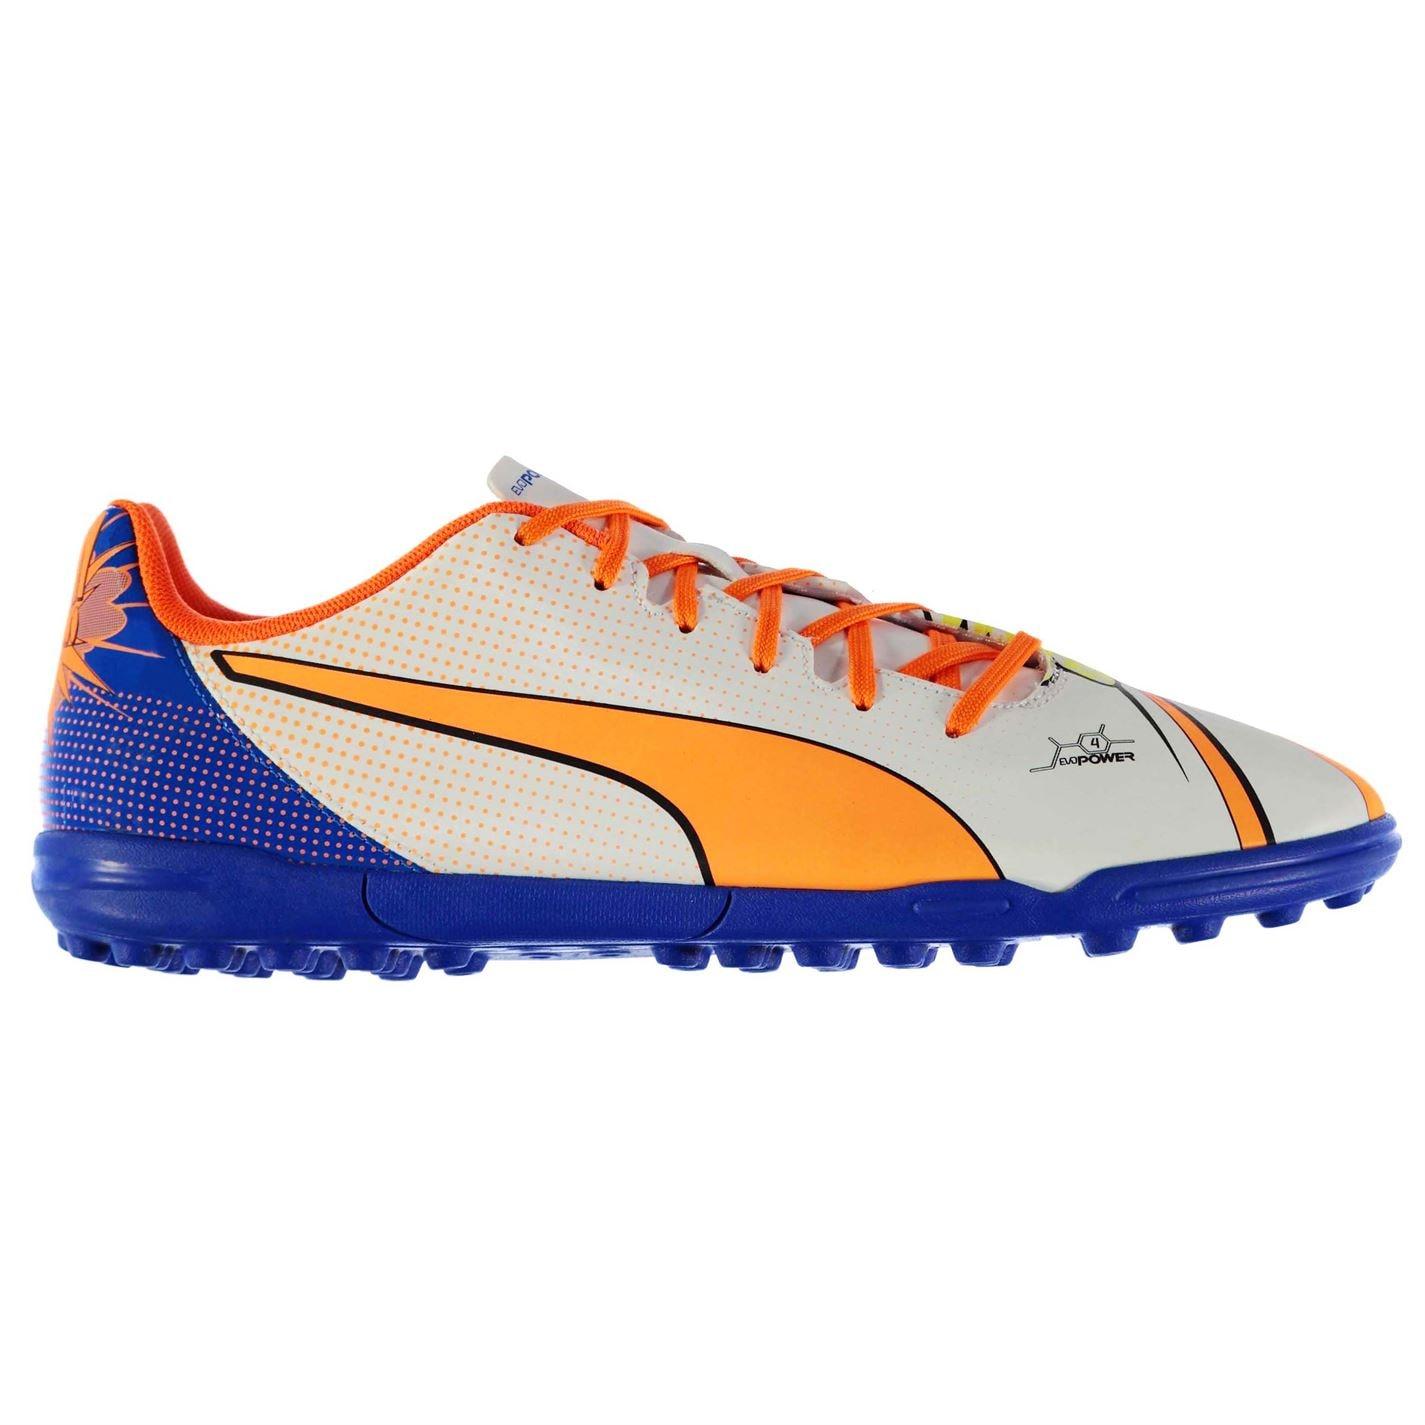 Puma Evopower 4.2 Firm Ground Football Boots Mens